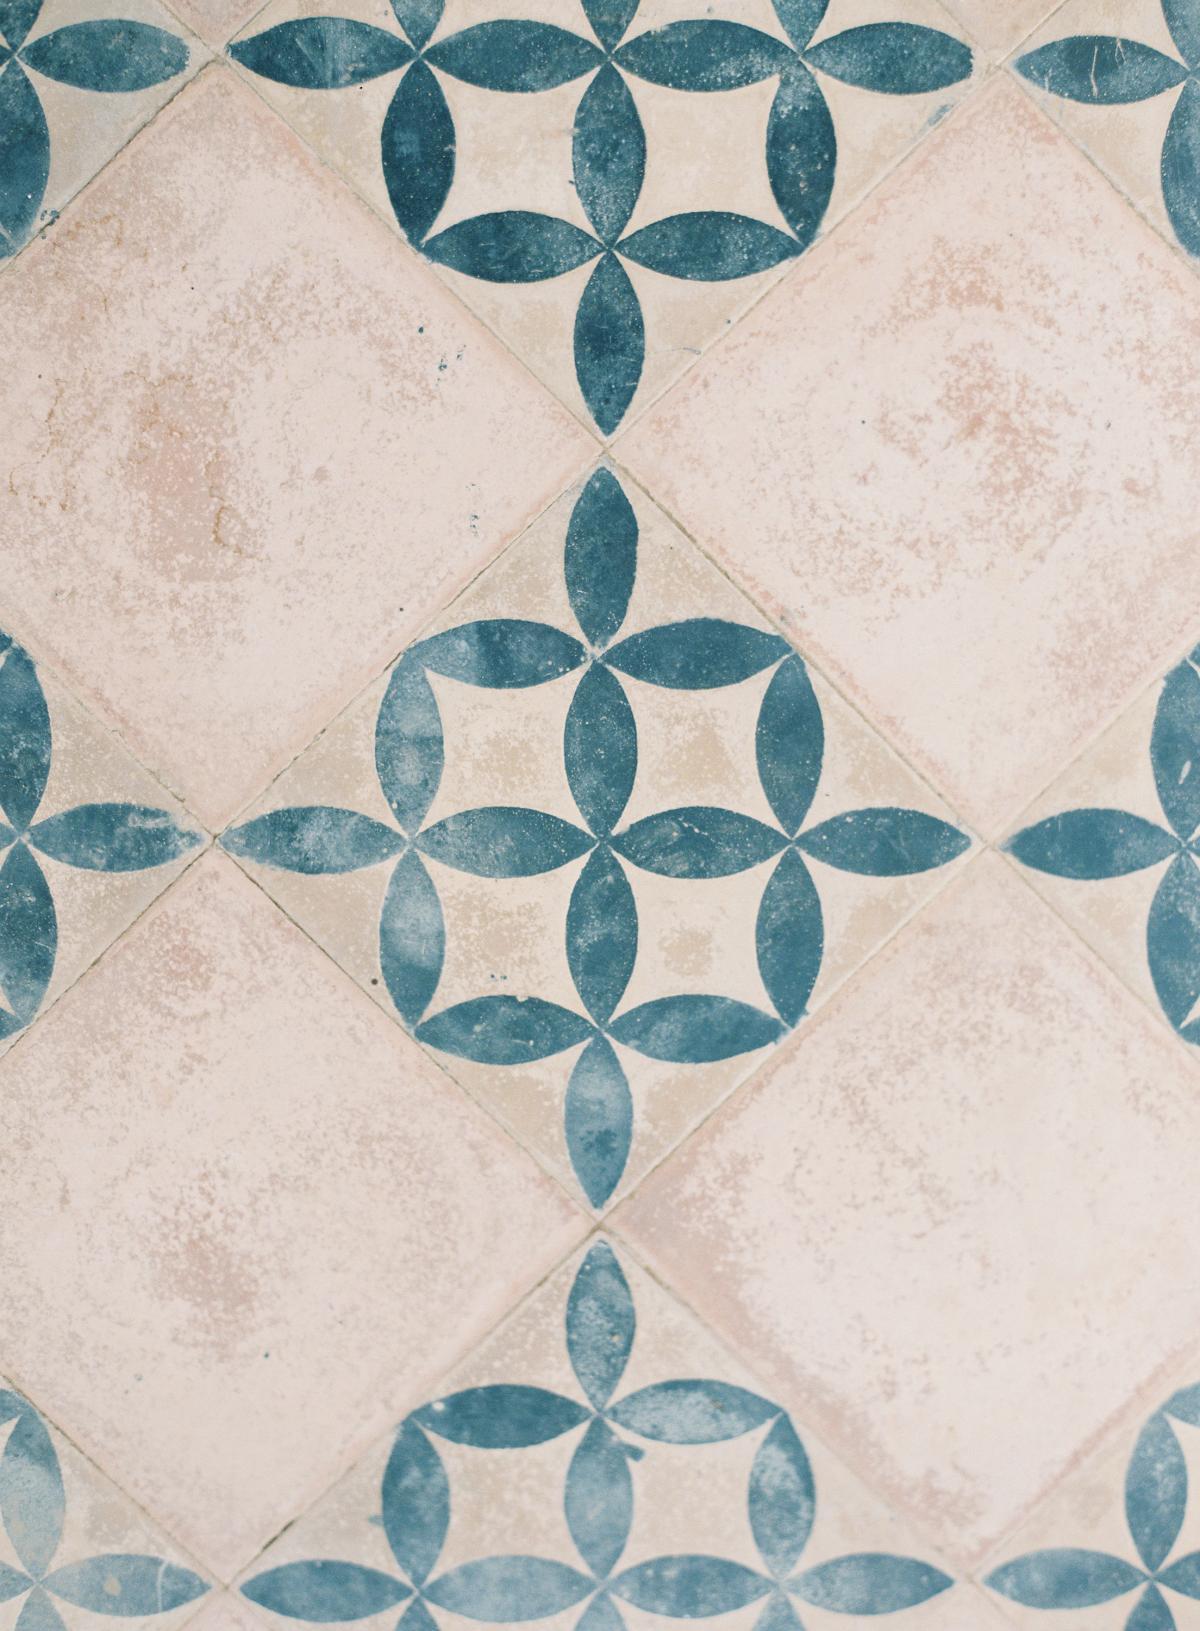 Peacock Pavilions Marrakech Morocco Interiors Photographer Omalley 0005